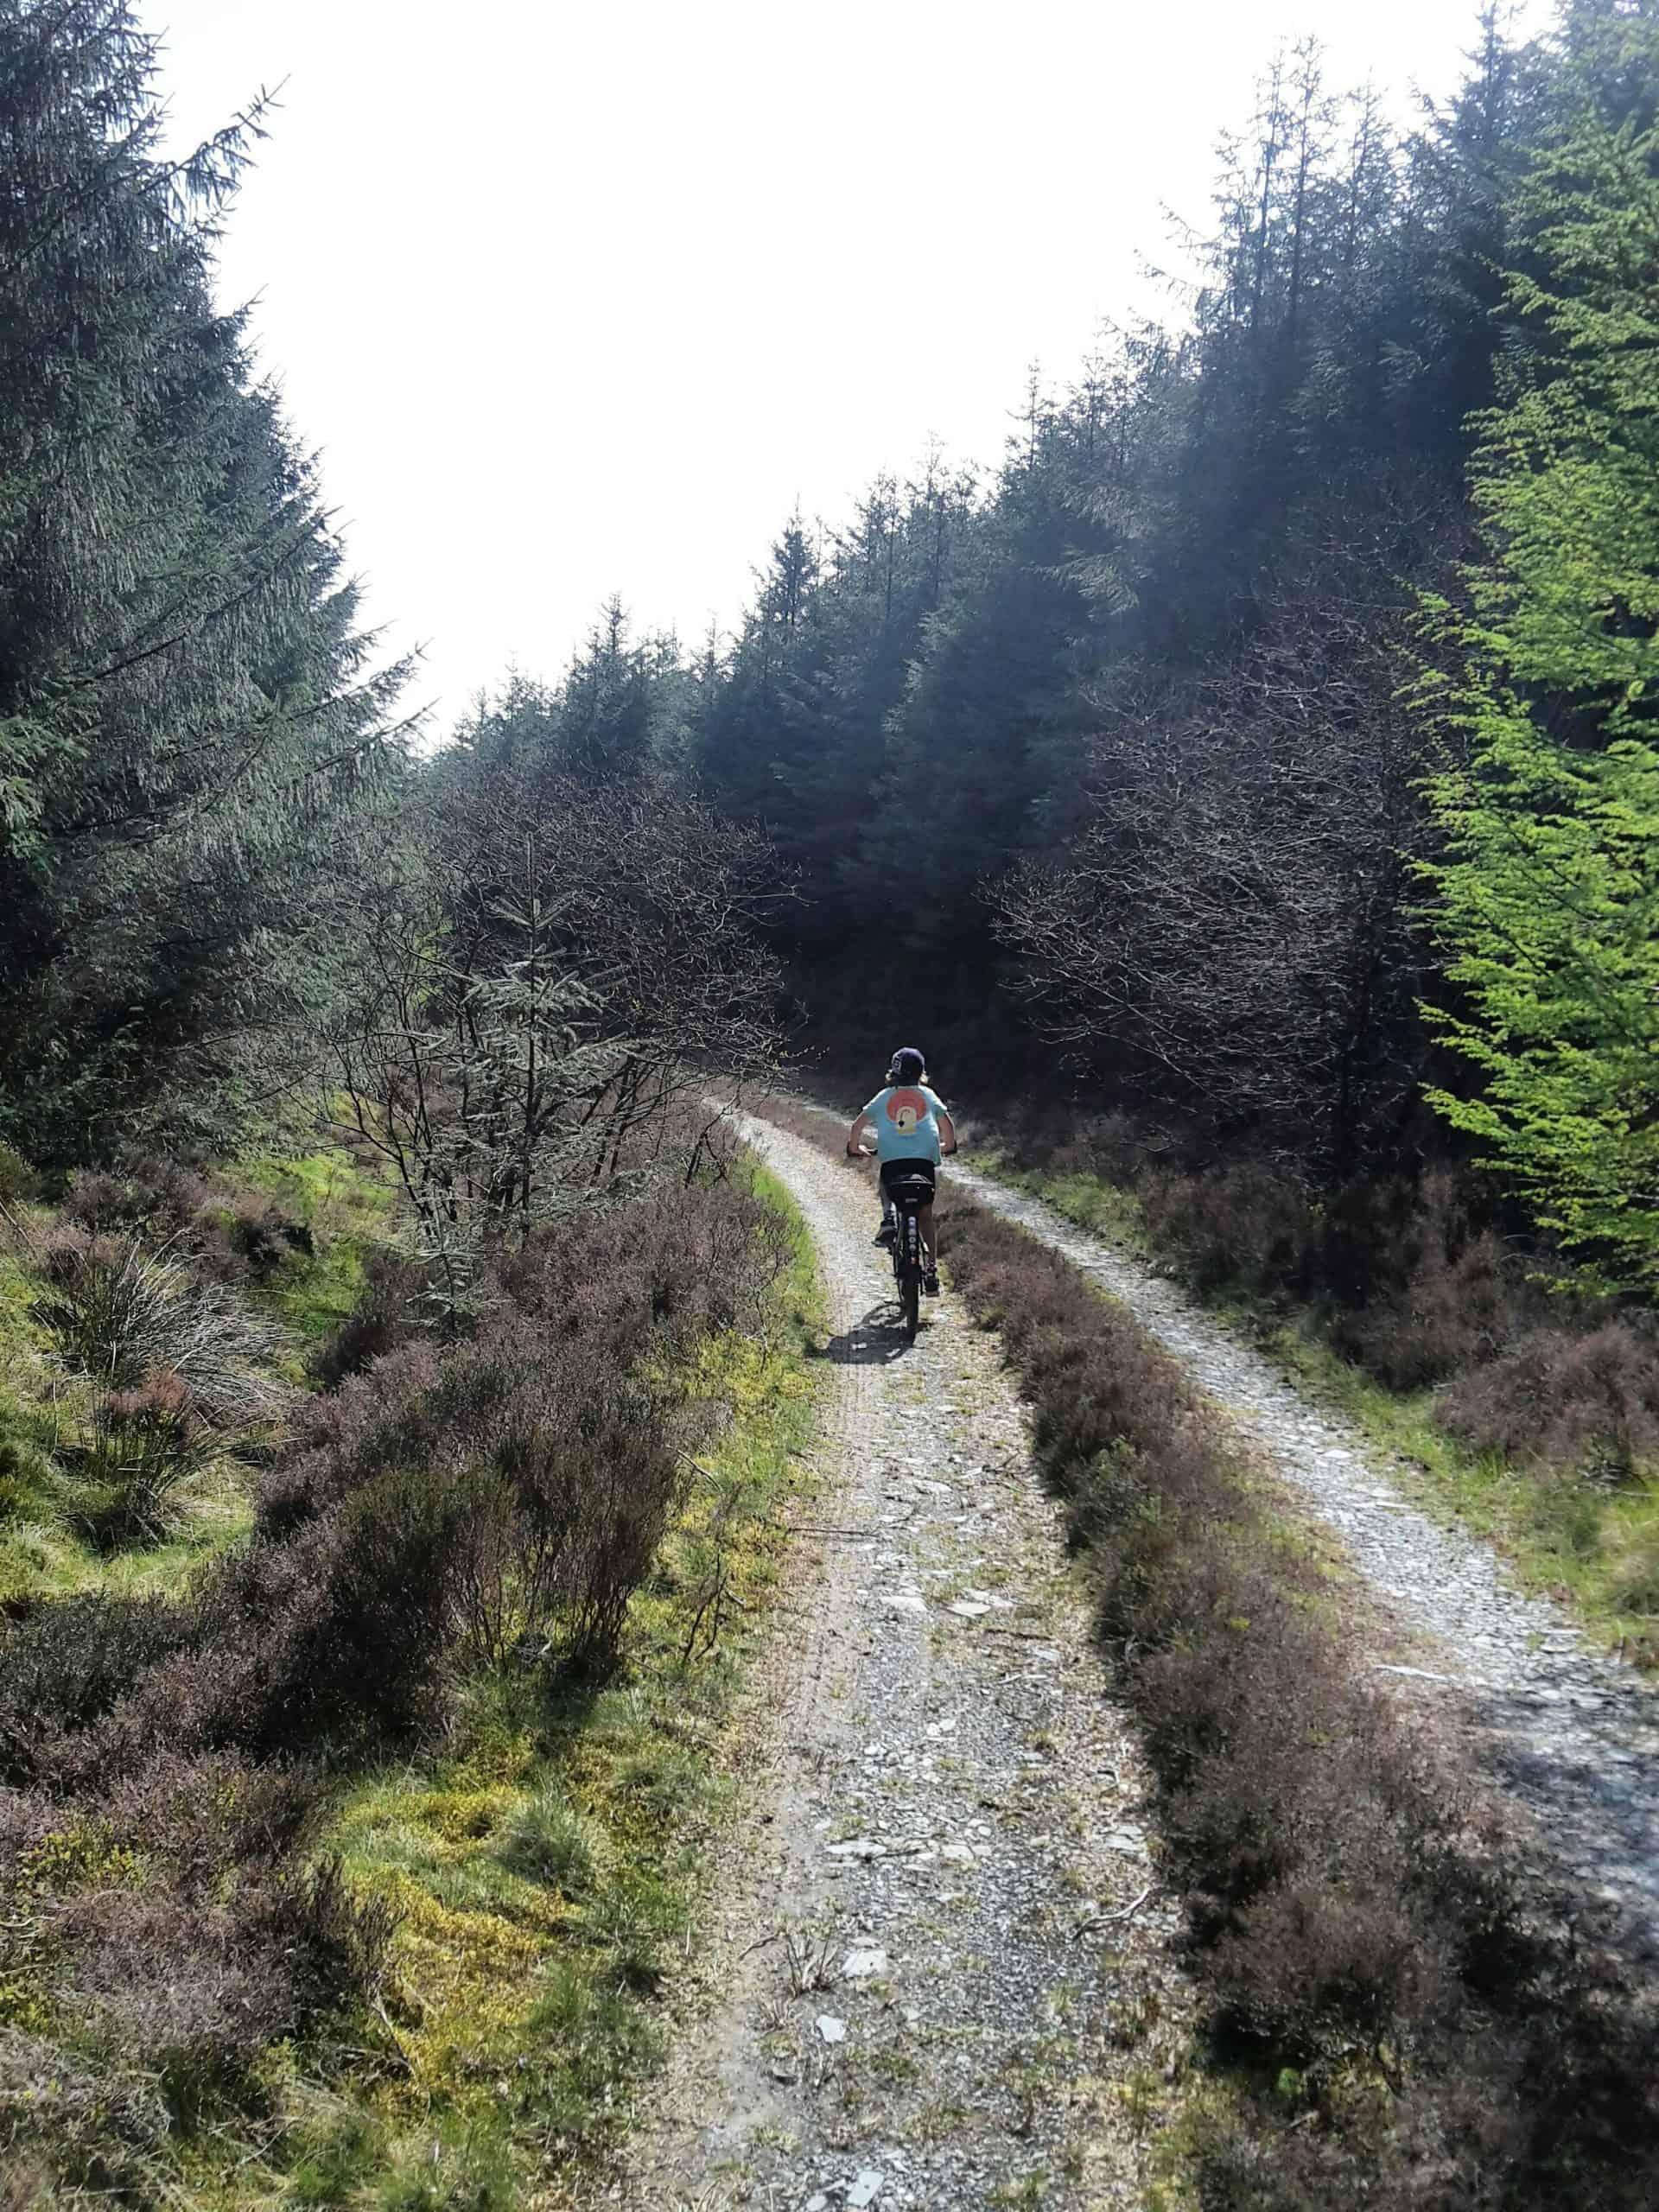 Snowdonia: Climbing Up, Riding Back 95